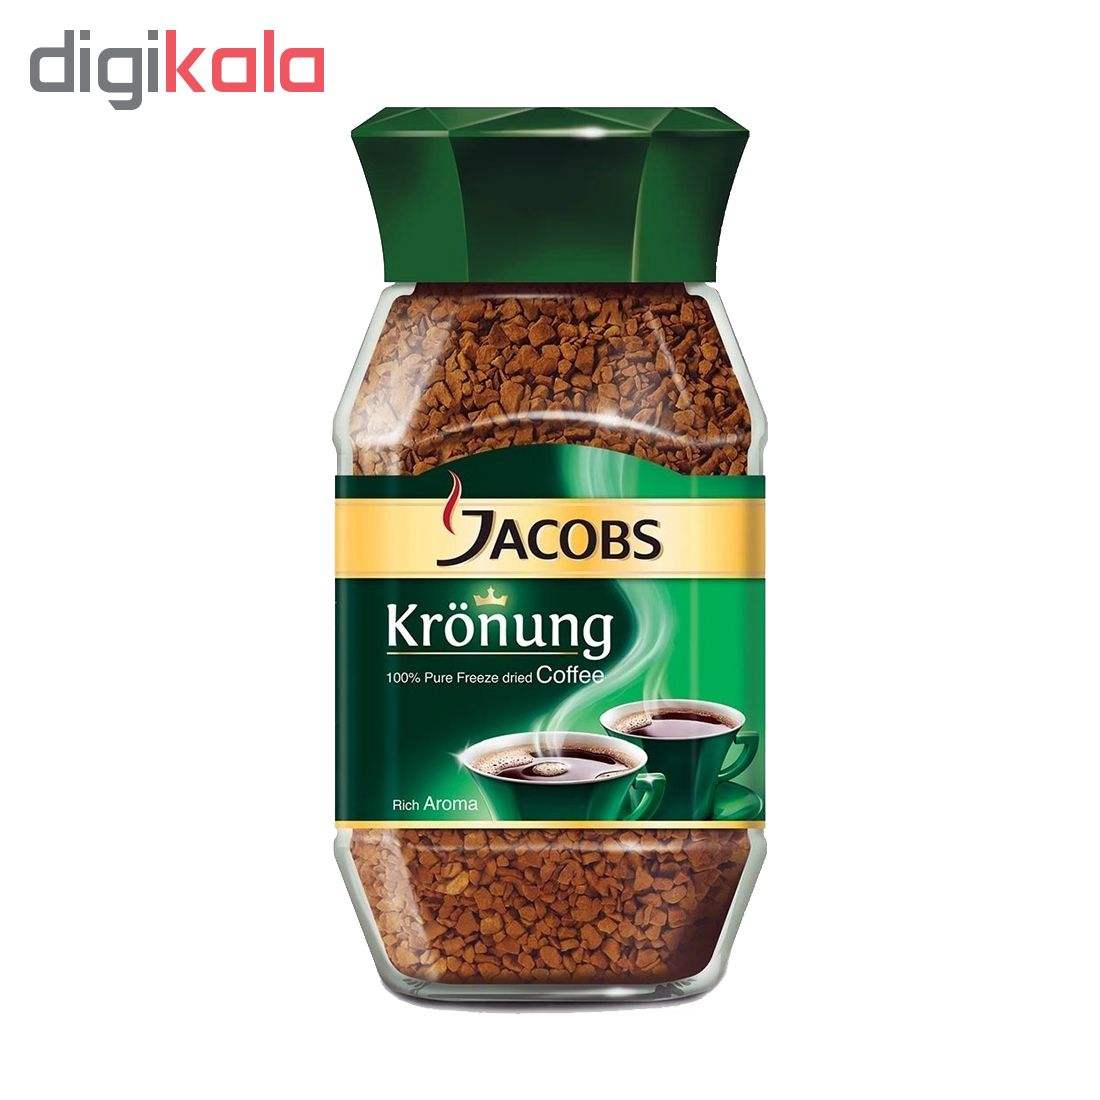 قوطی قهوه فوری جاکوبز مدل مونارک مقدار 200 گرم main 1 1